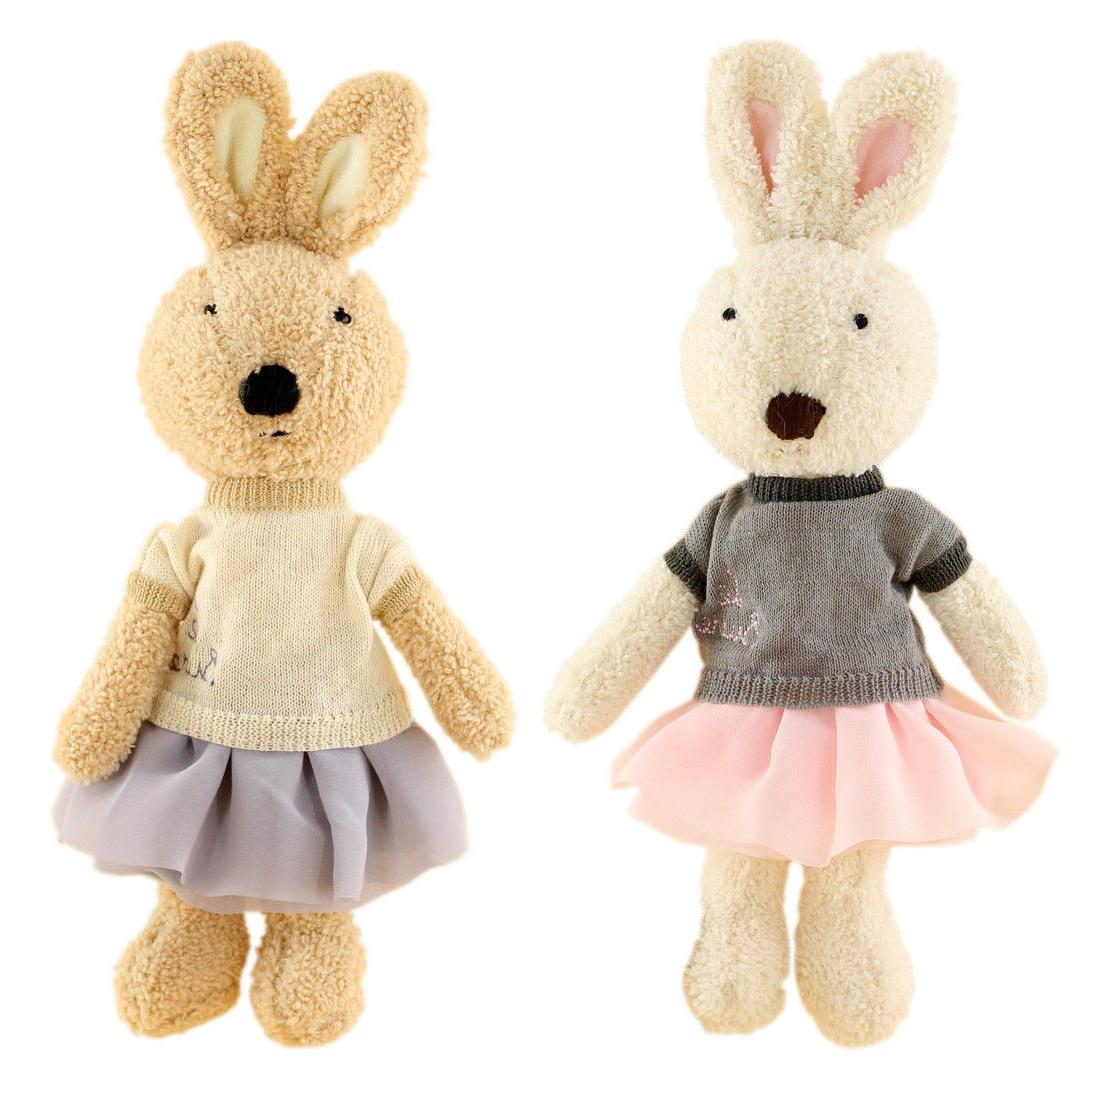 toy bunny rabbits stuffed plush